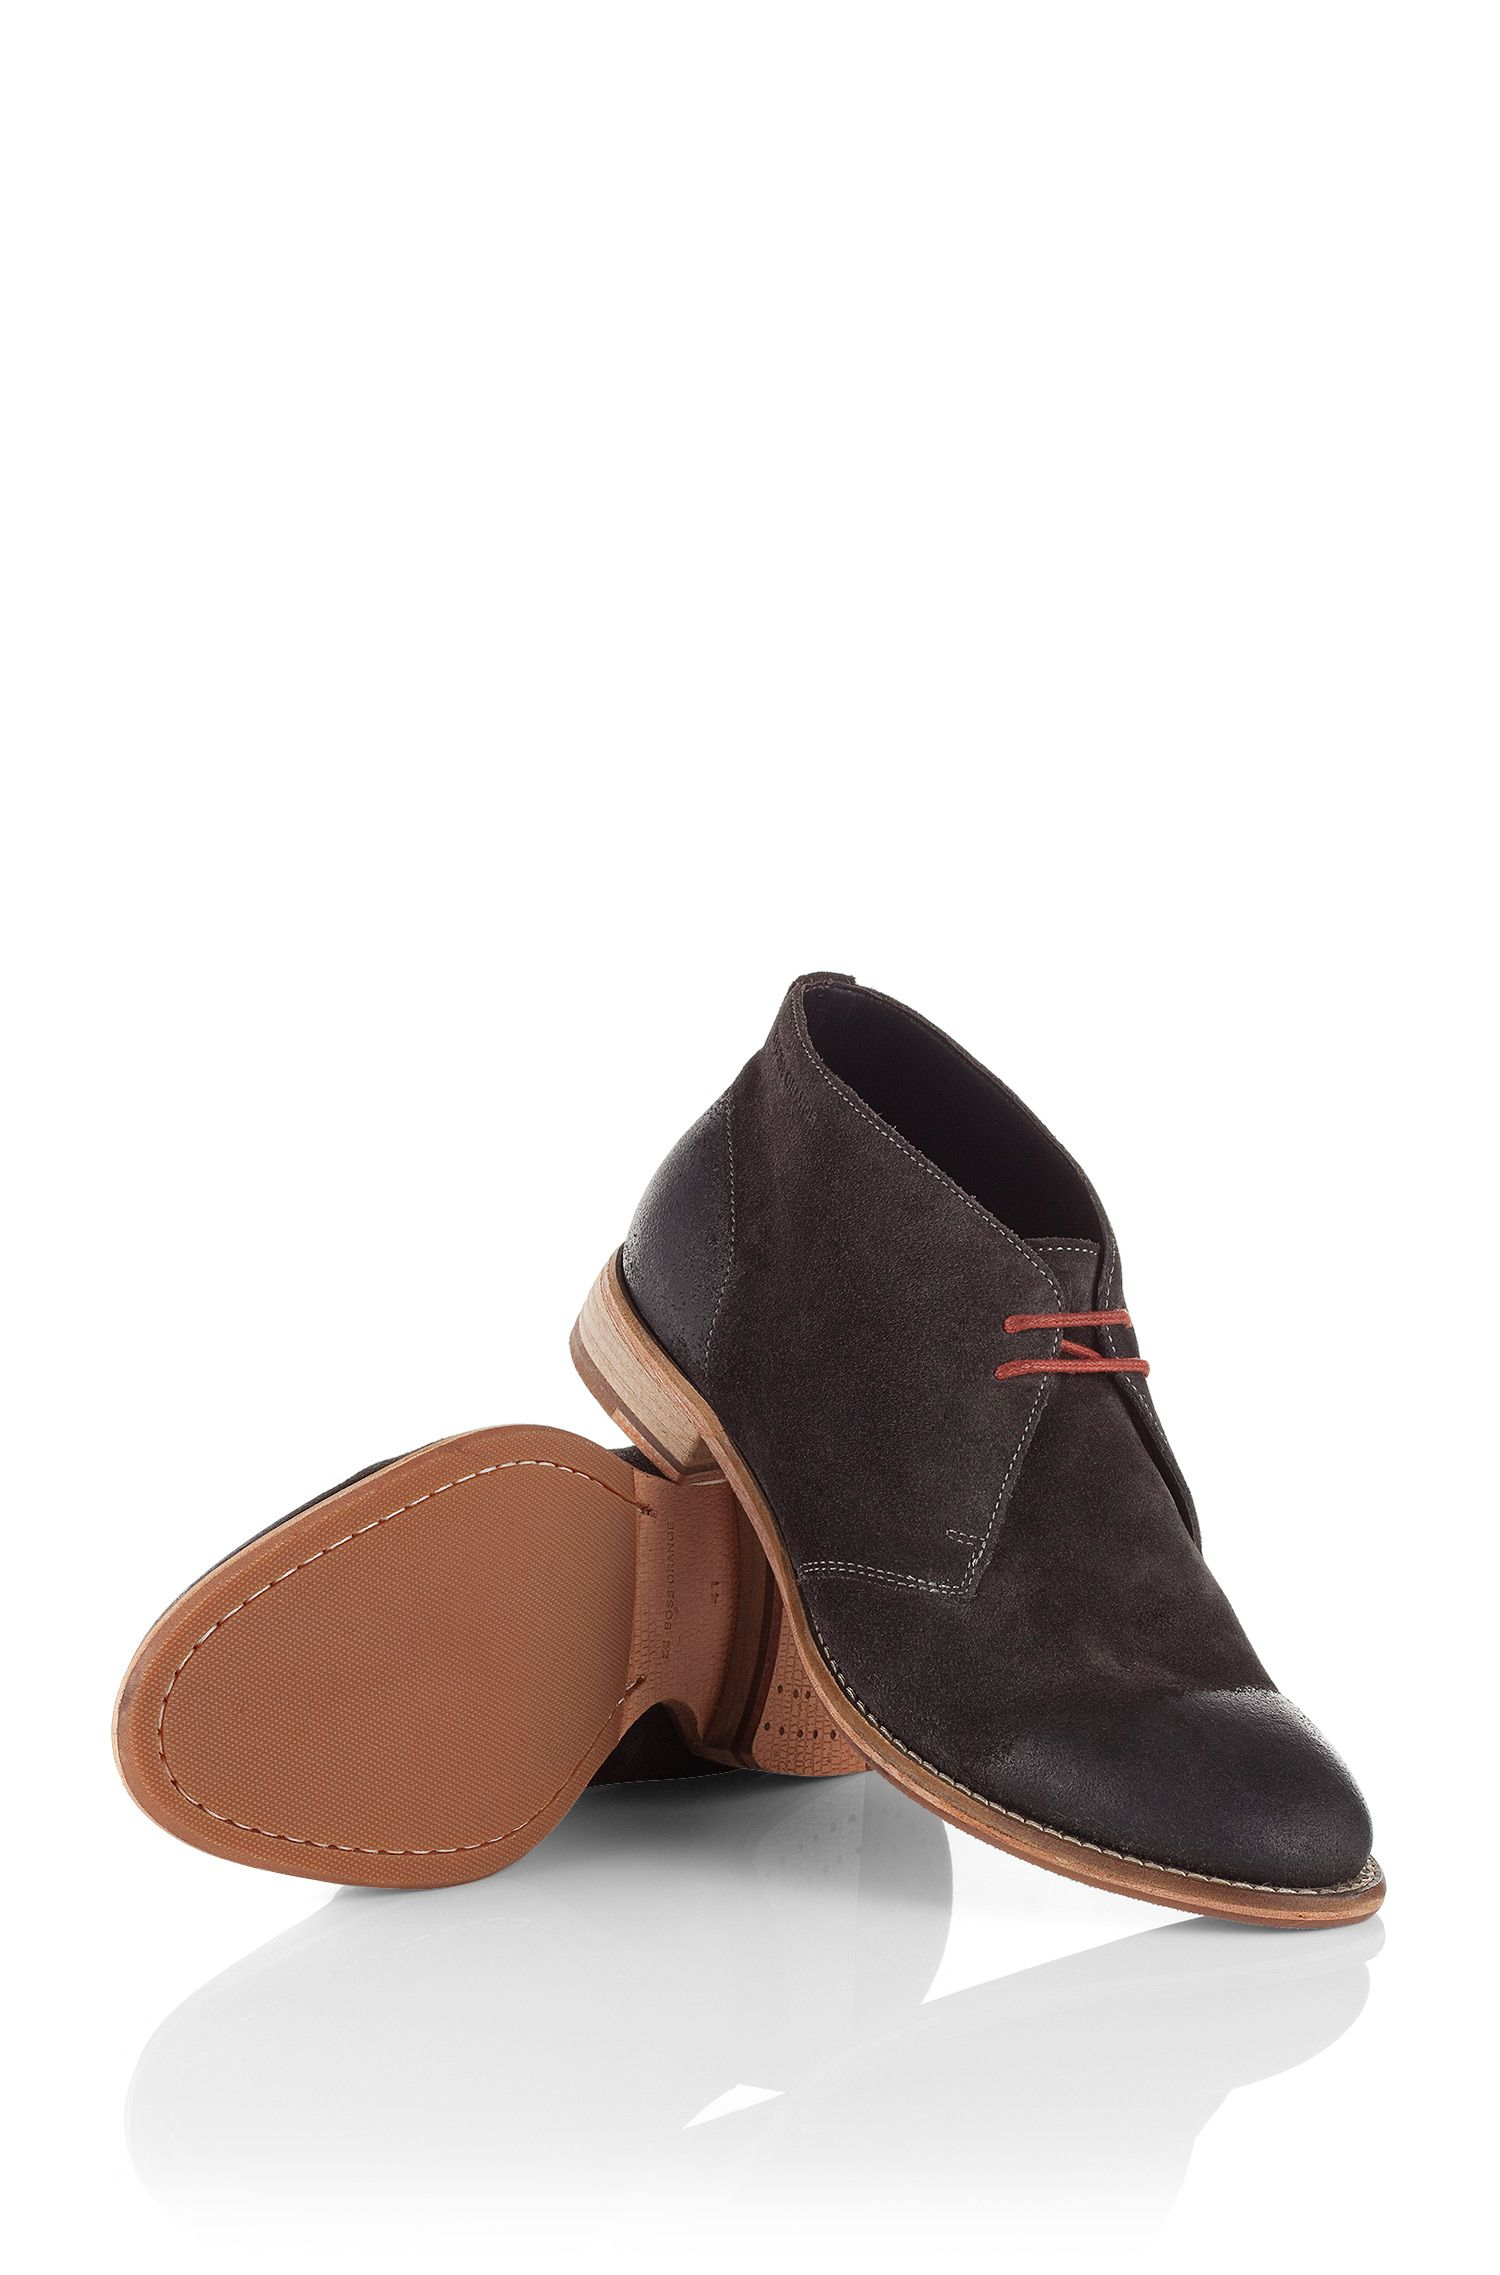 Lederschuh ´Sailoc` im Desert Boot-Stil